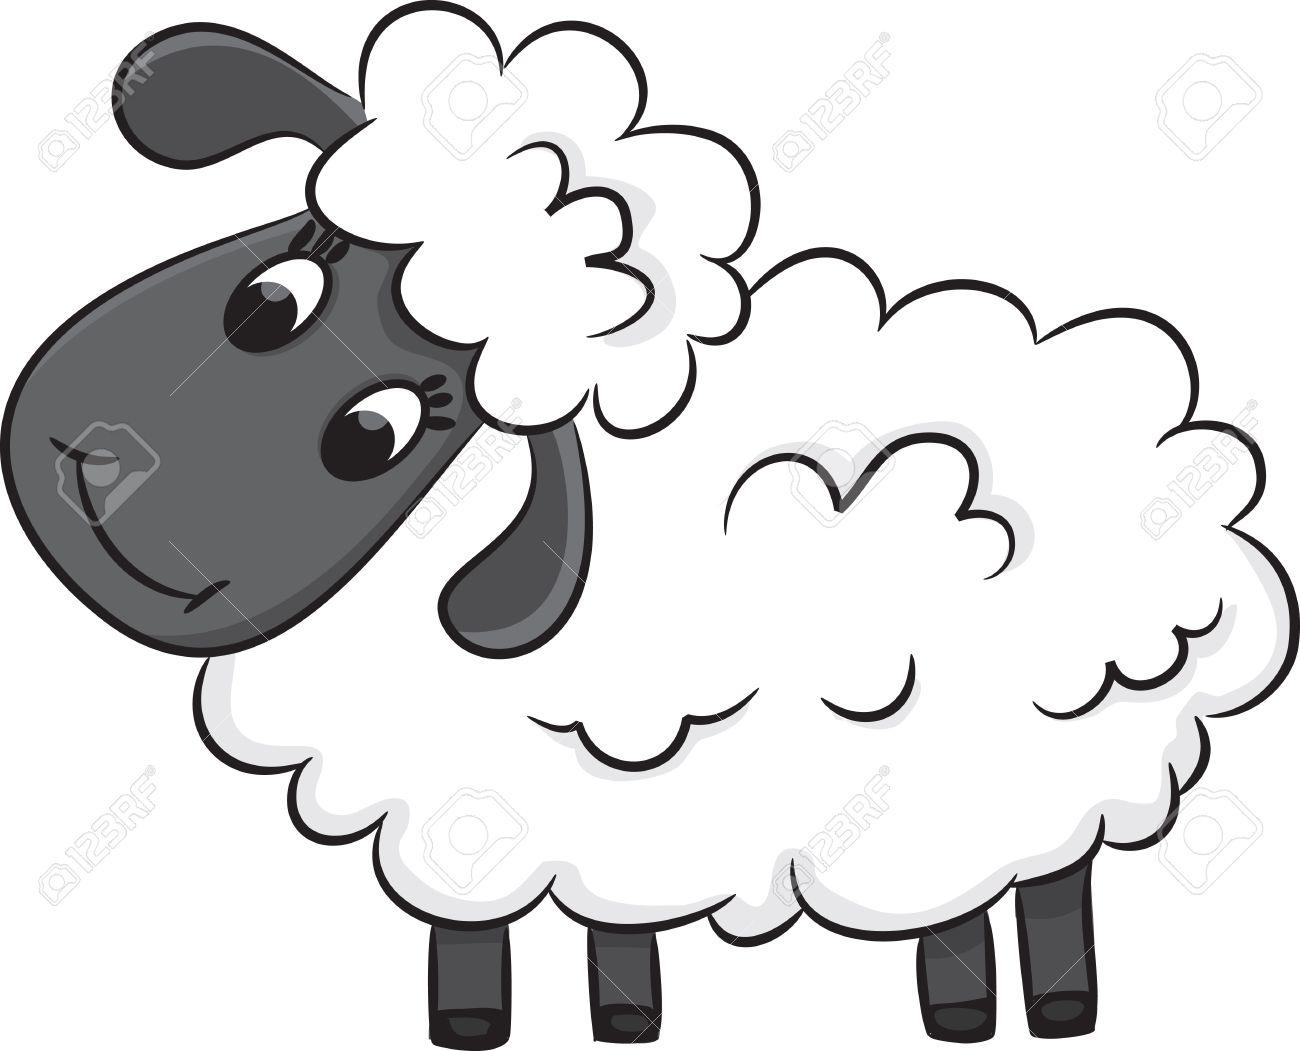 cartoon sheep vector illustration royalty free cliparts vectors rh 123rf com cartoon sheep photos cartoon sheep dog images